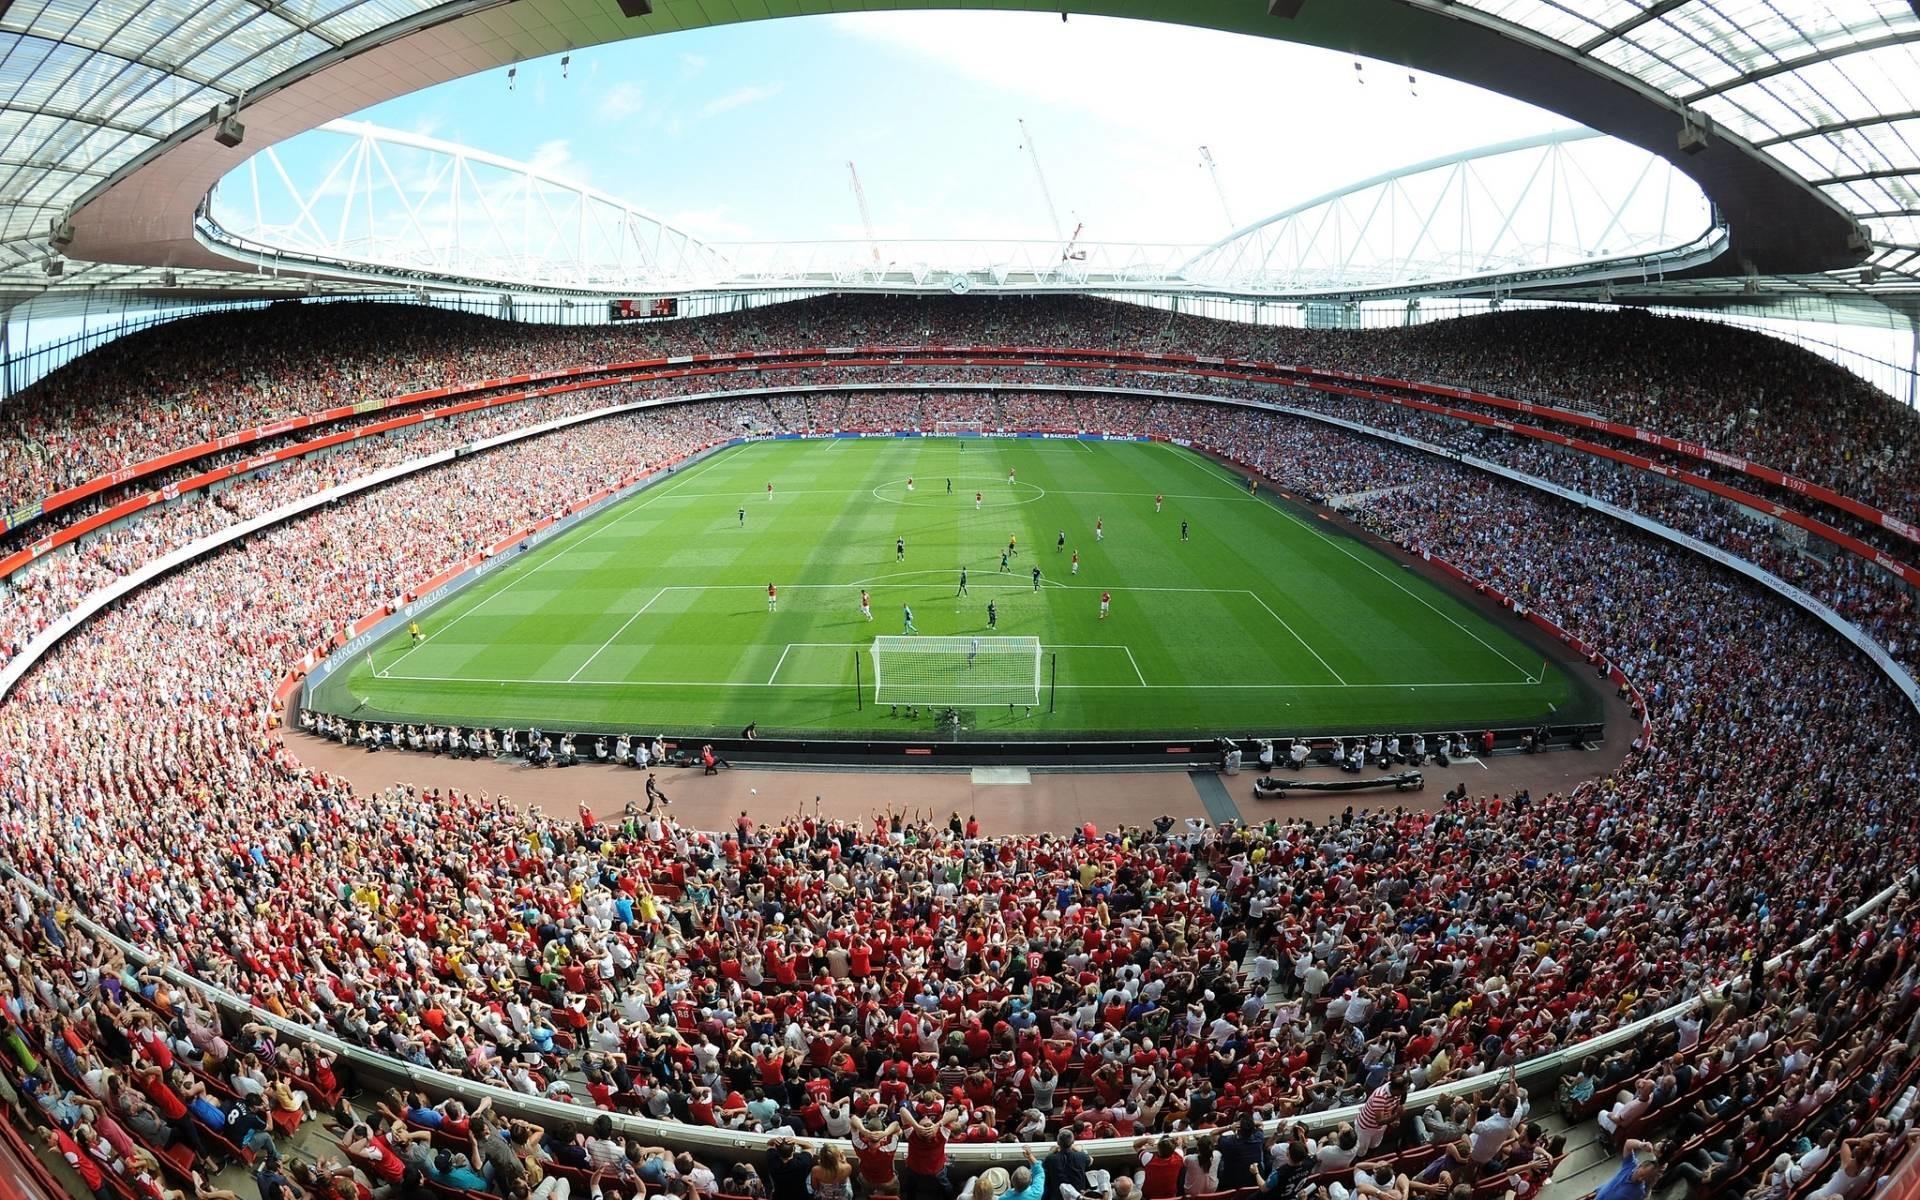 Res: 1920x1200, Arsenal Emirates Stadium Wallpaper High Quality Resolution